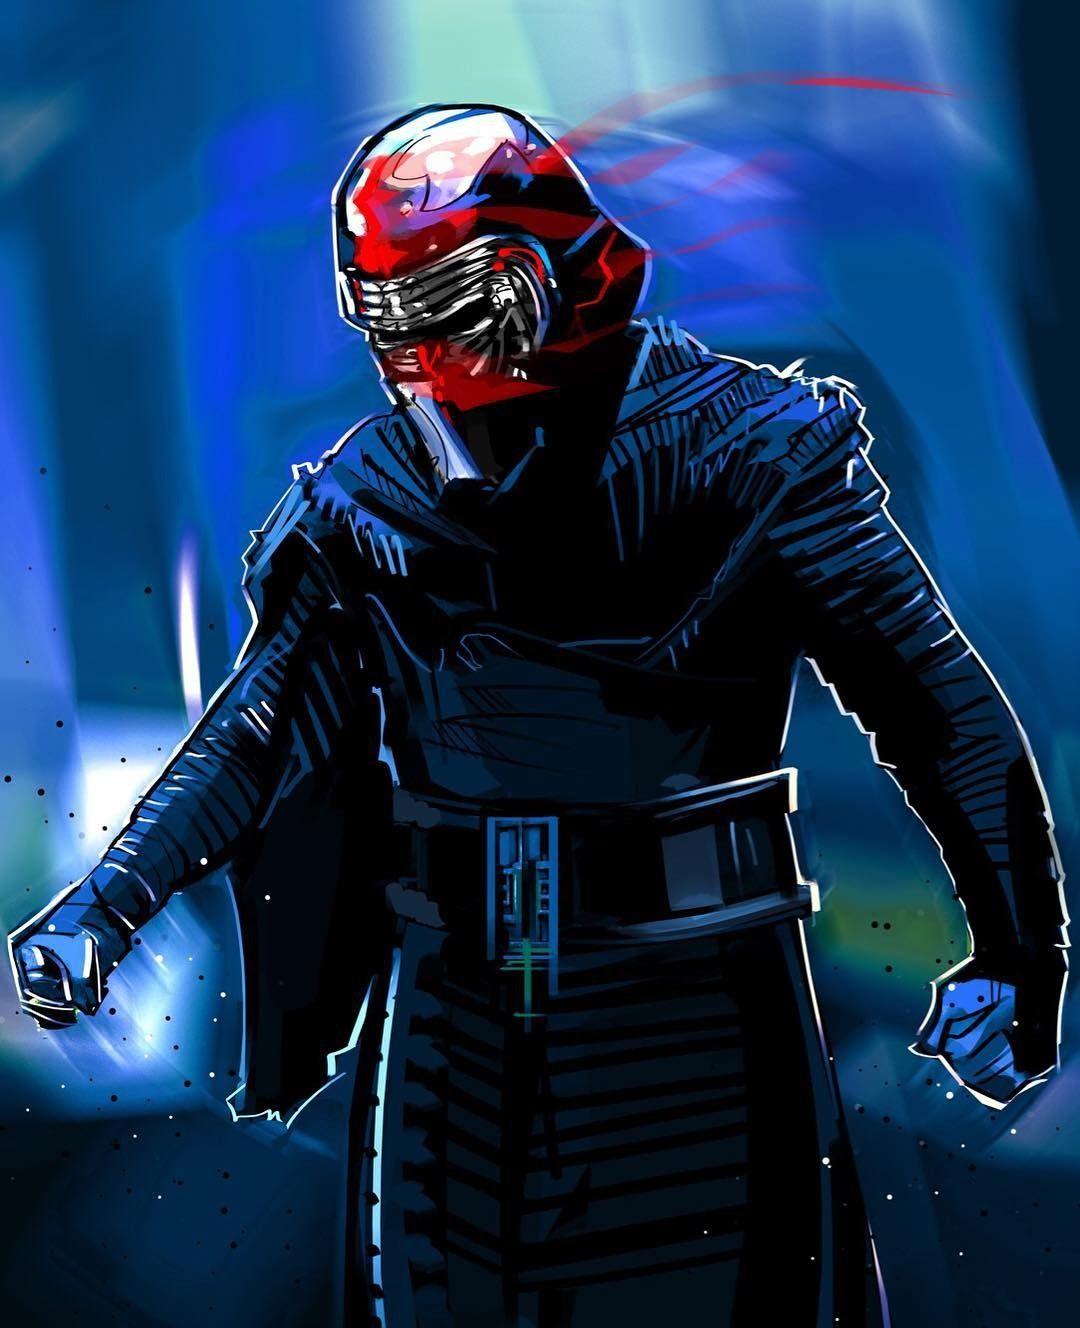 Kylo Ren Episode IX starwars art by venamis Star wars